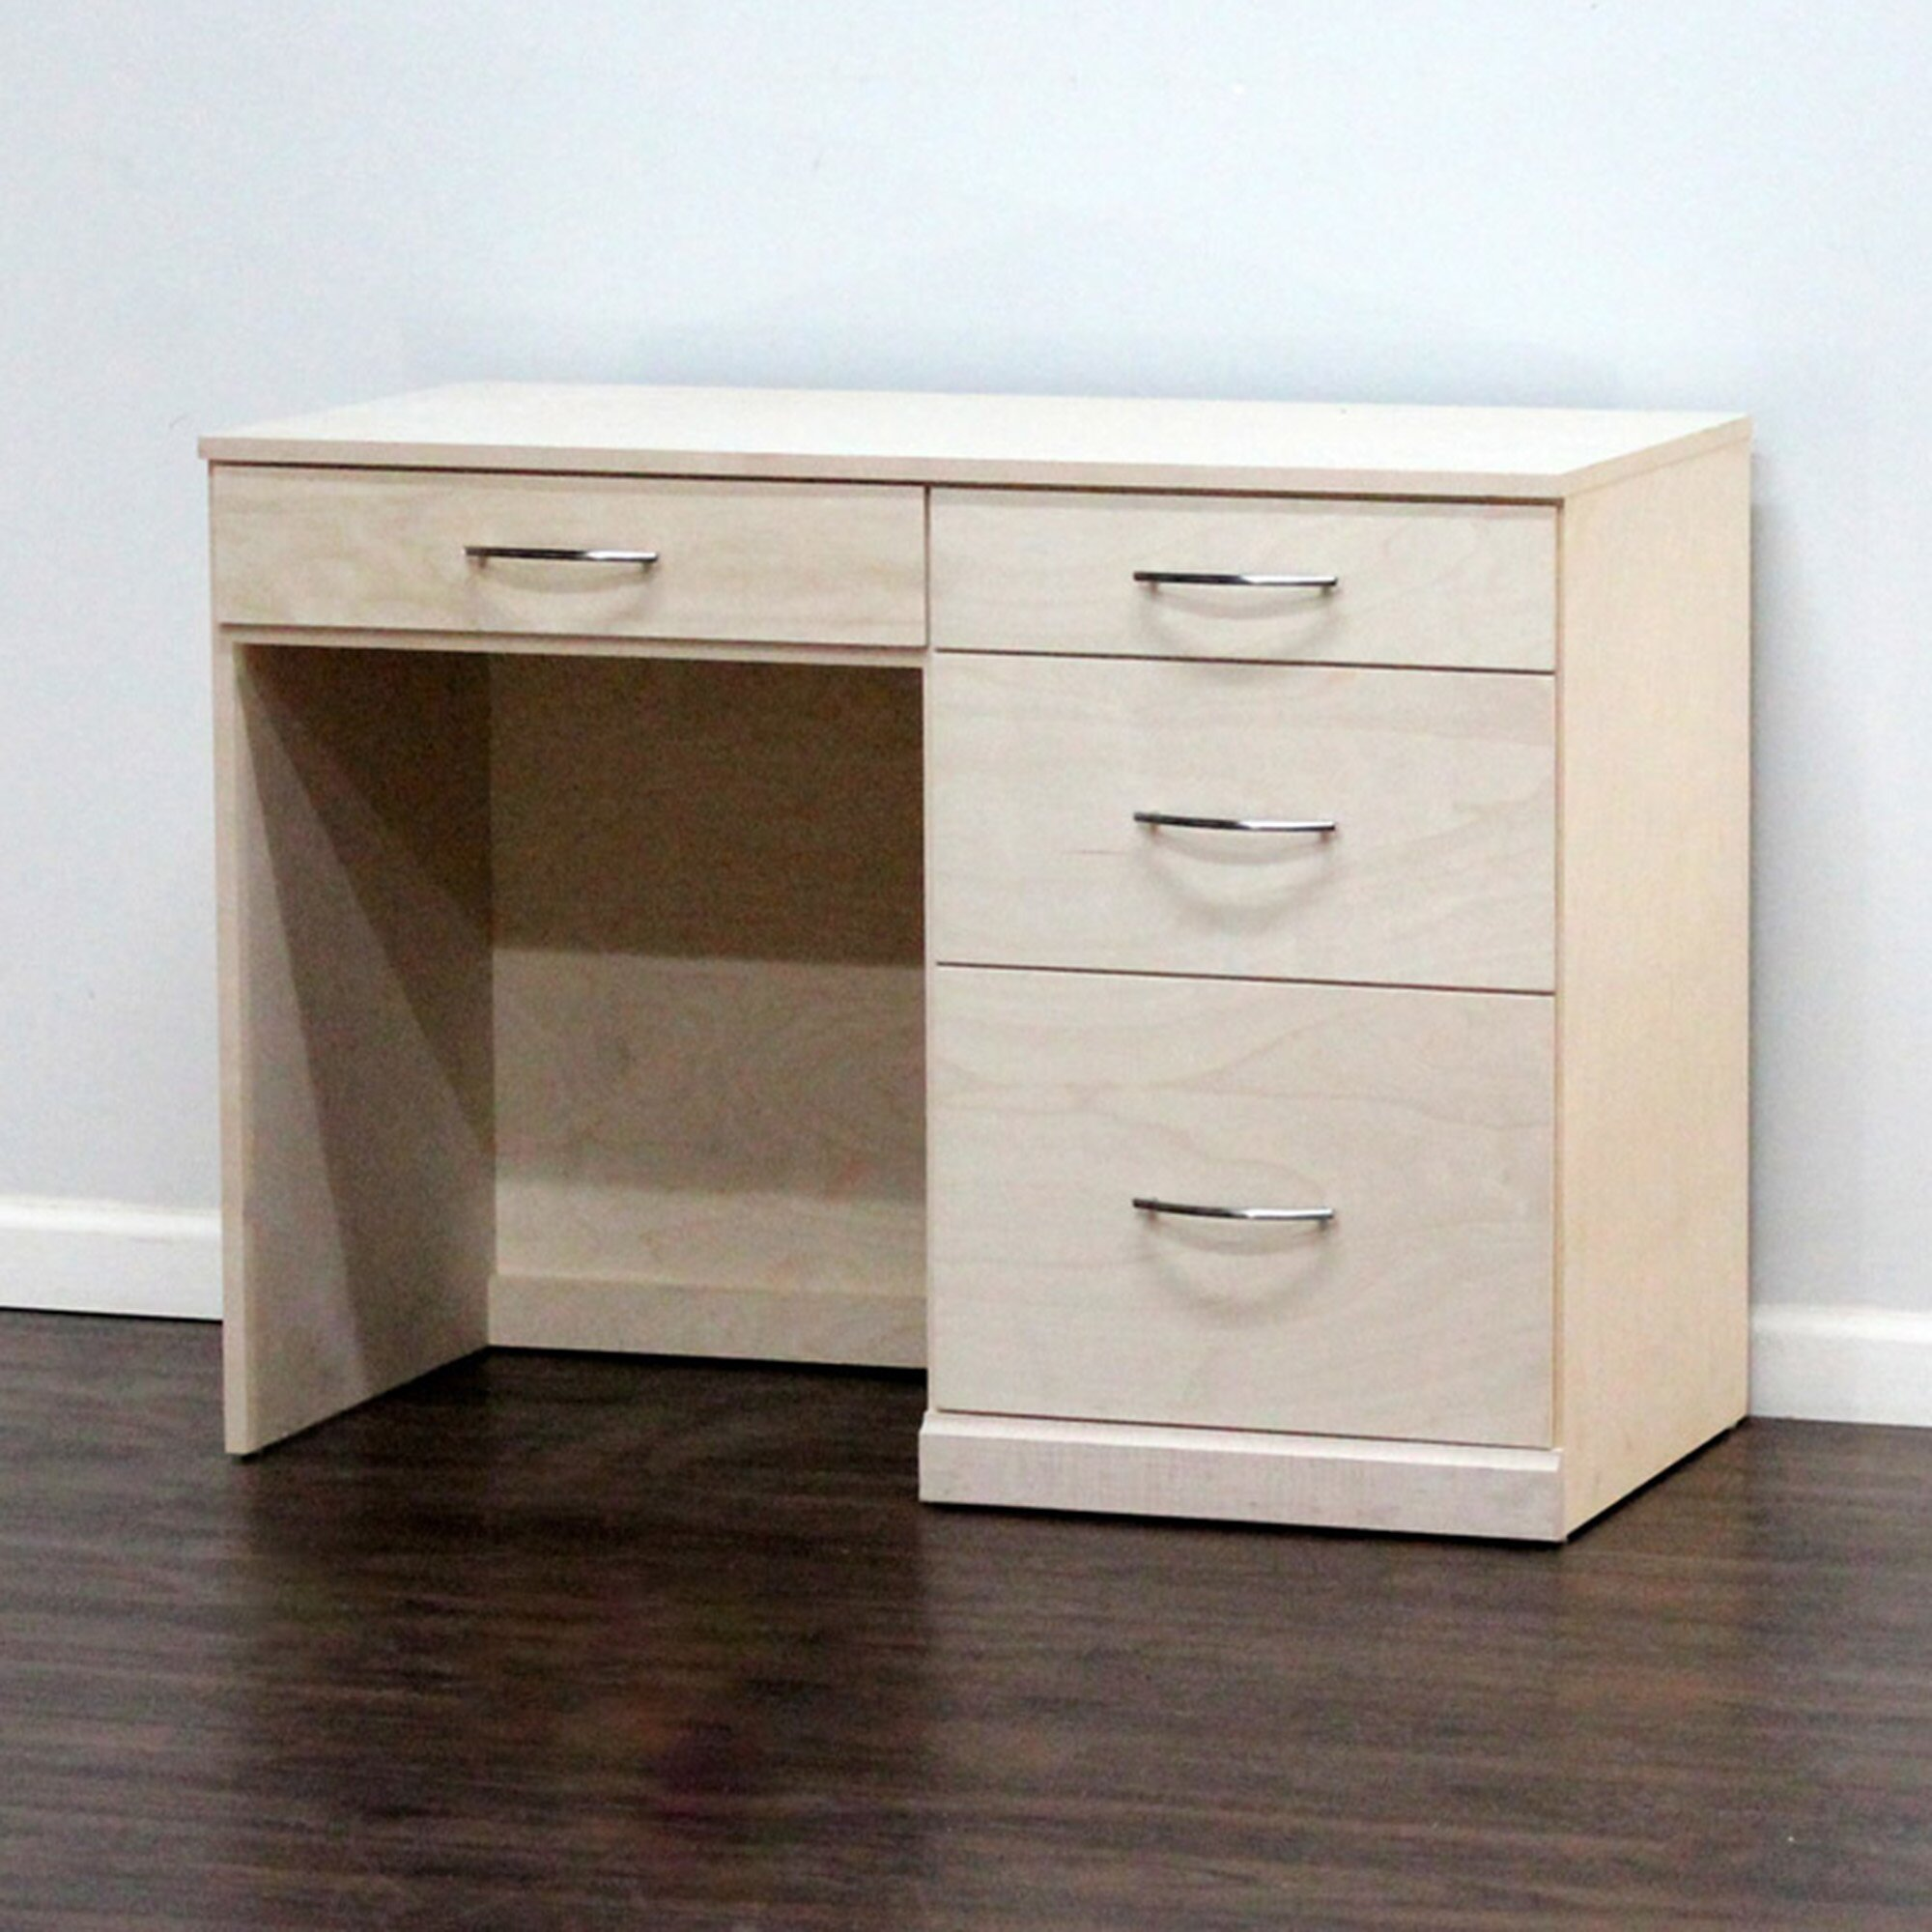 gothic furniture flat iron computer desk with 4 drawer wayfair. Black Bedroom Furniture Sets. Home Design Ideas